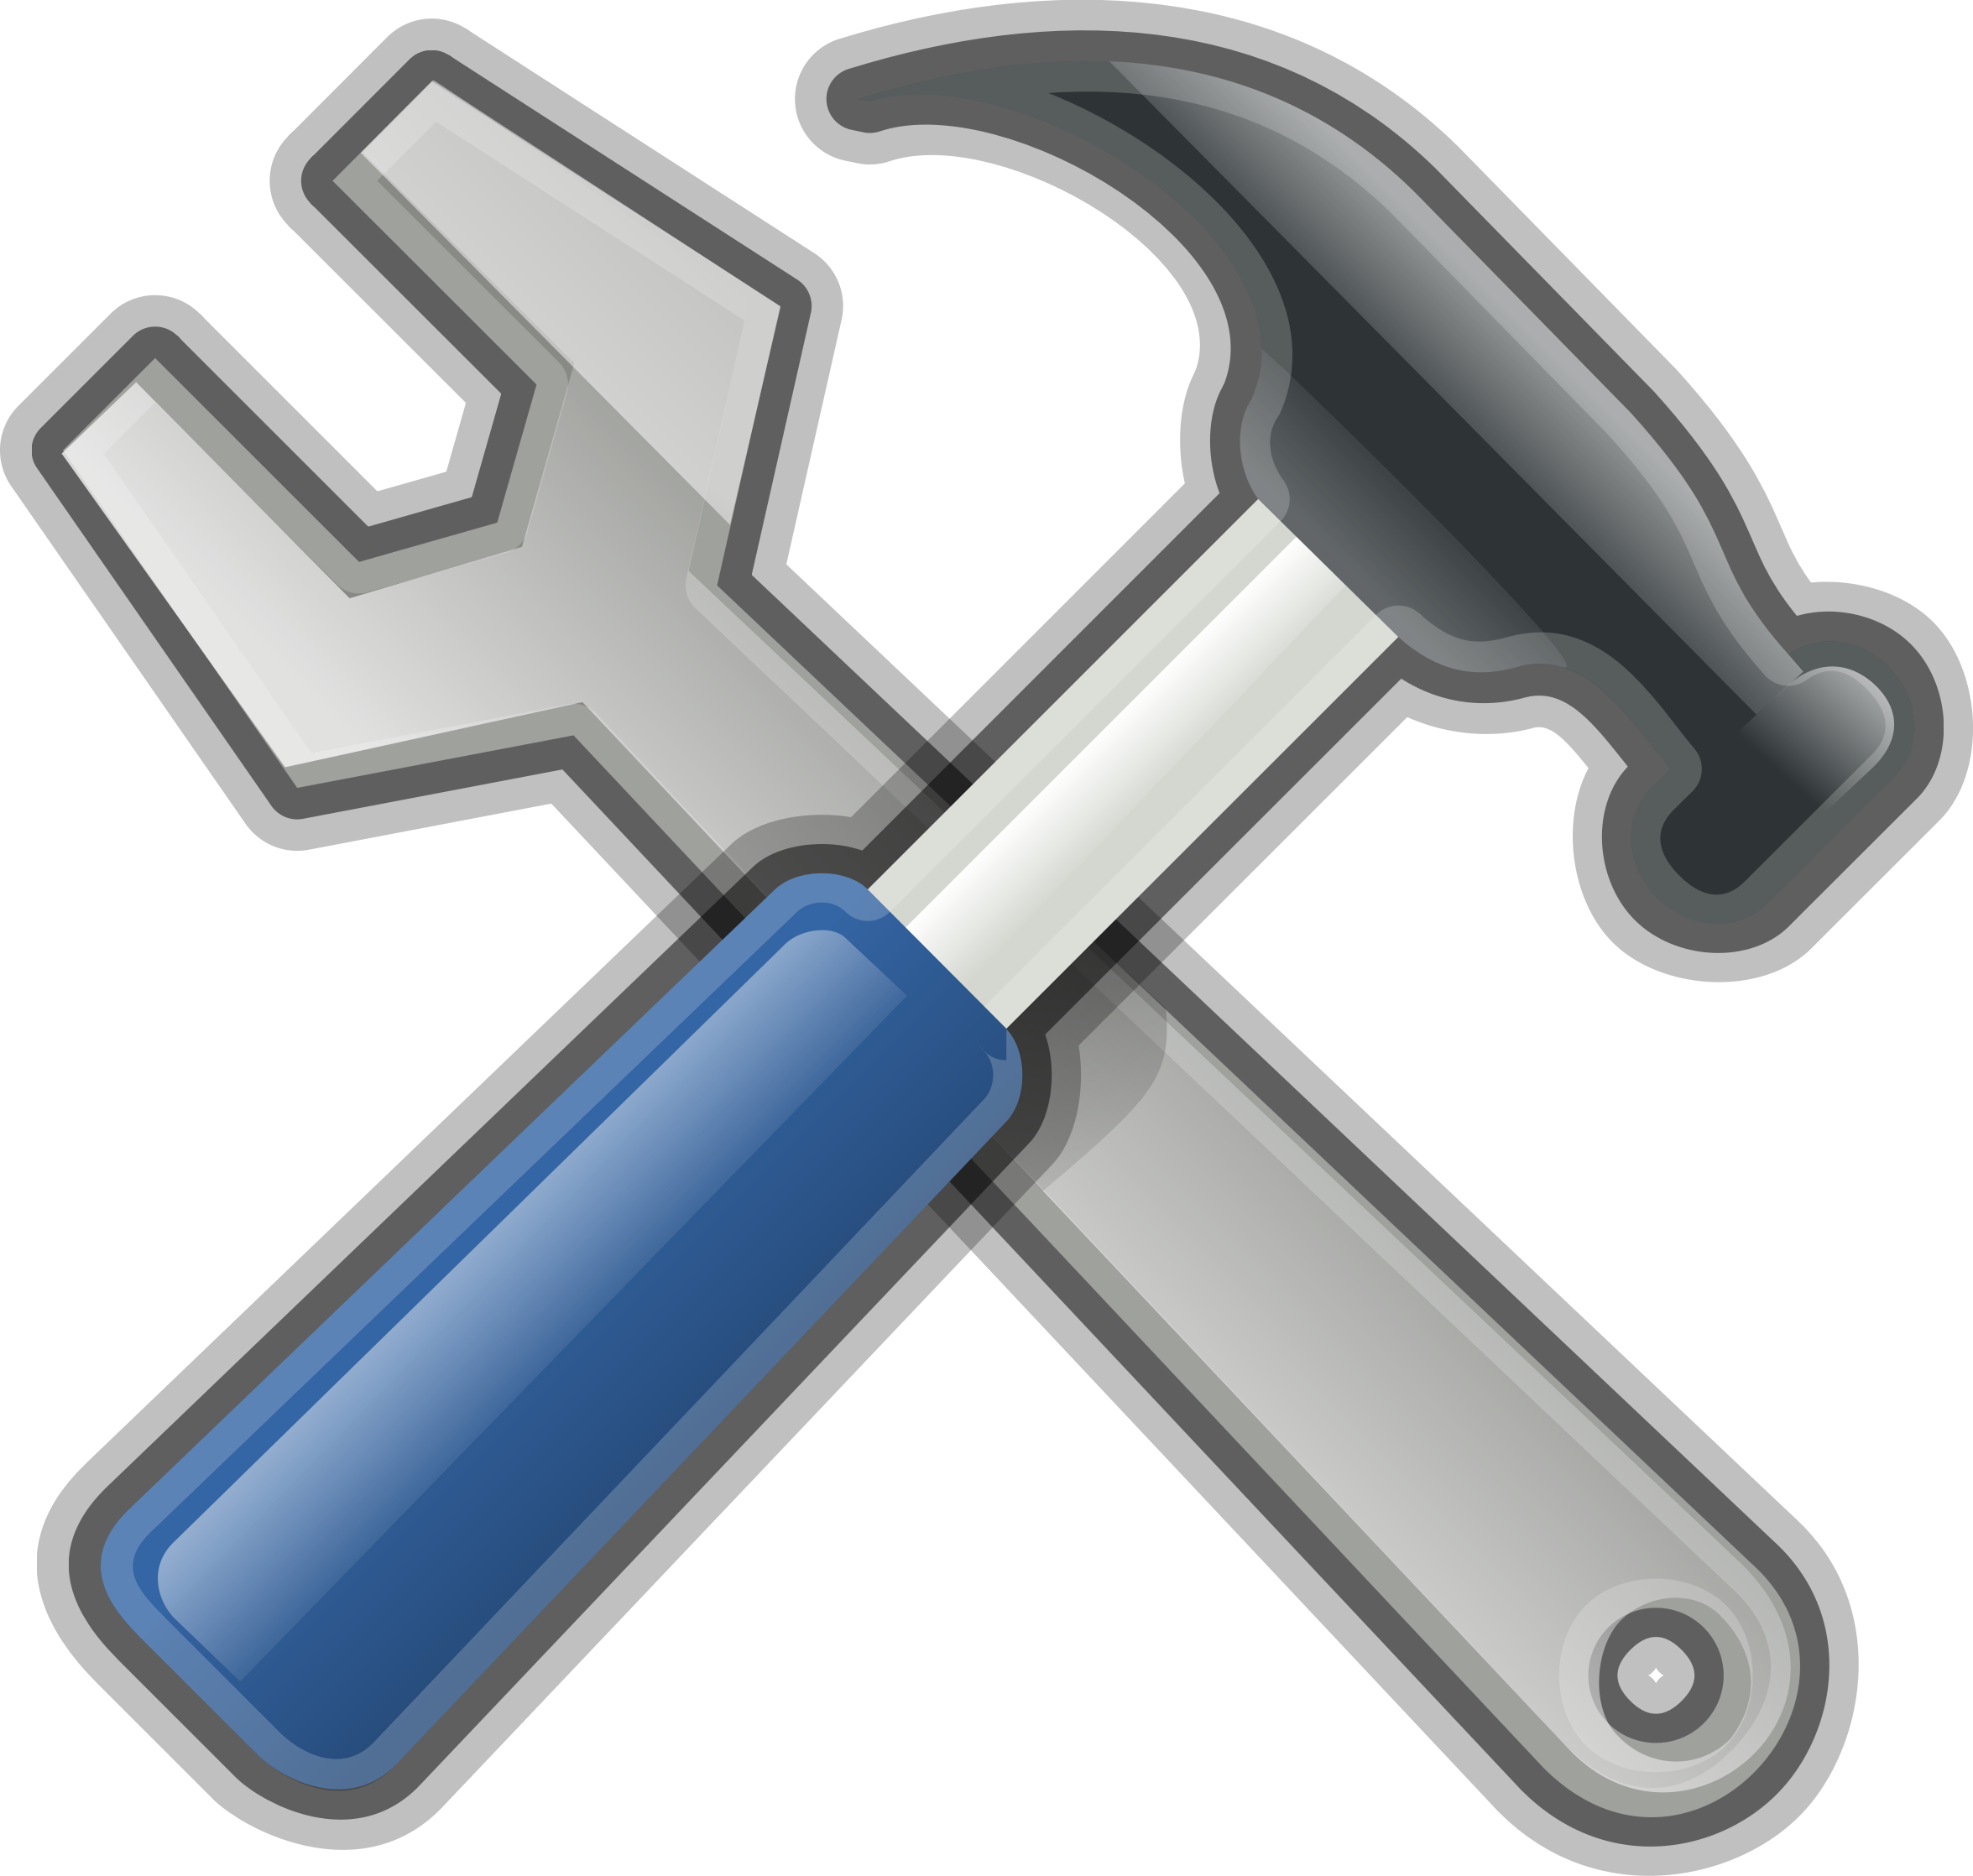 Tools spanner big image. Clipart hammer metal